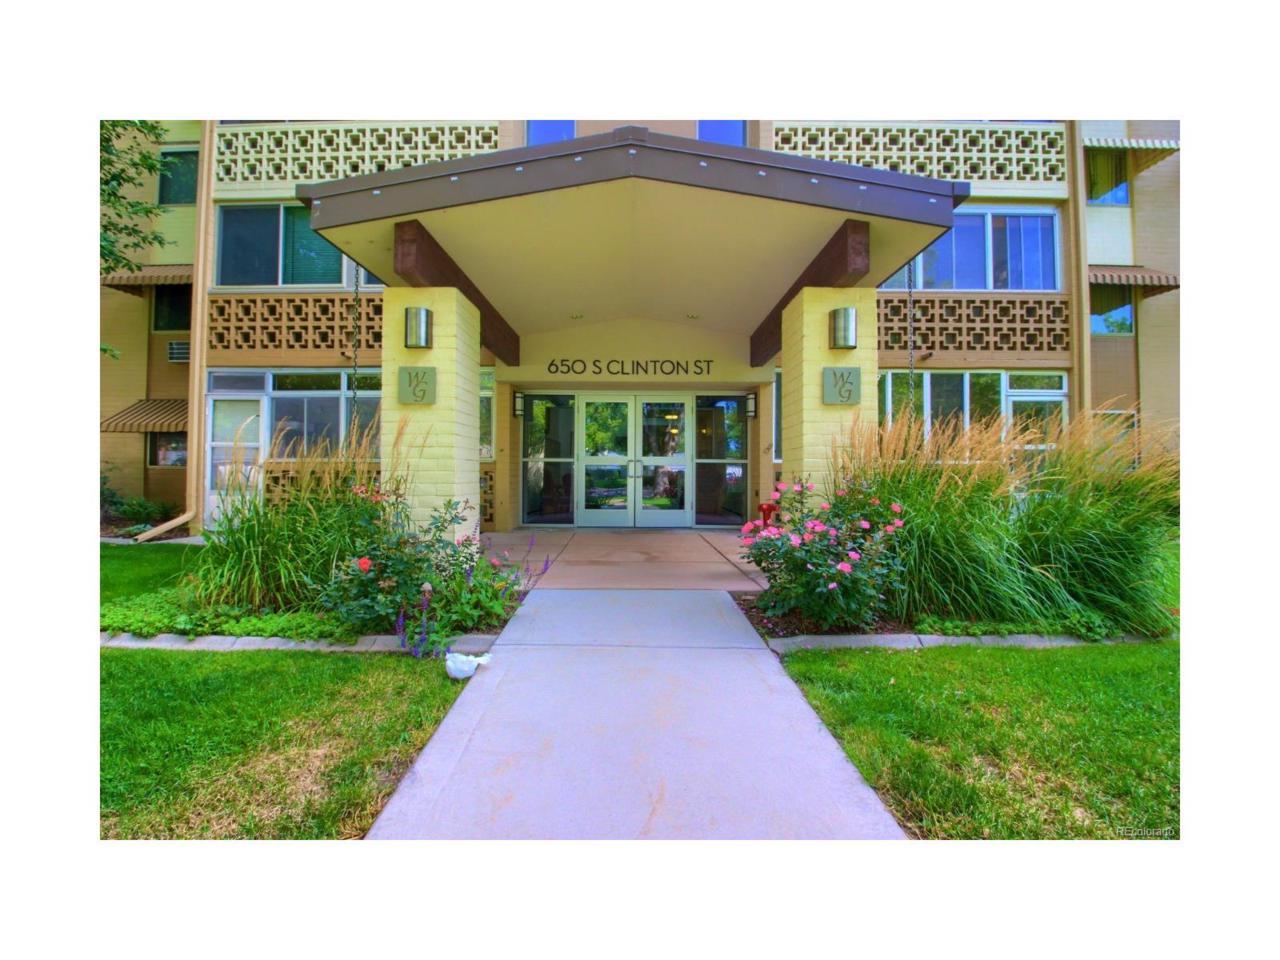 650 S Clinton Street 4C, Denver, CO 80247 (MLS #9891090) :: 8z Real Estate